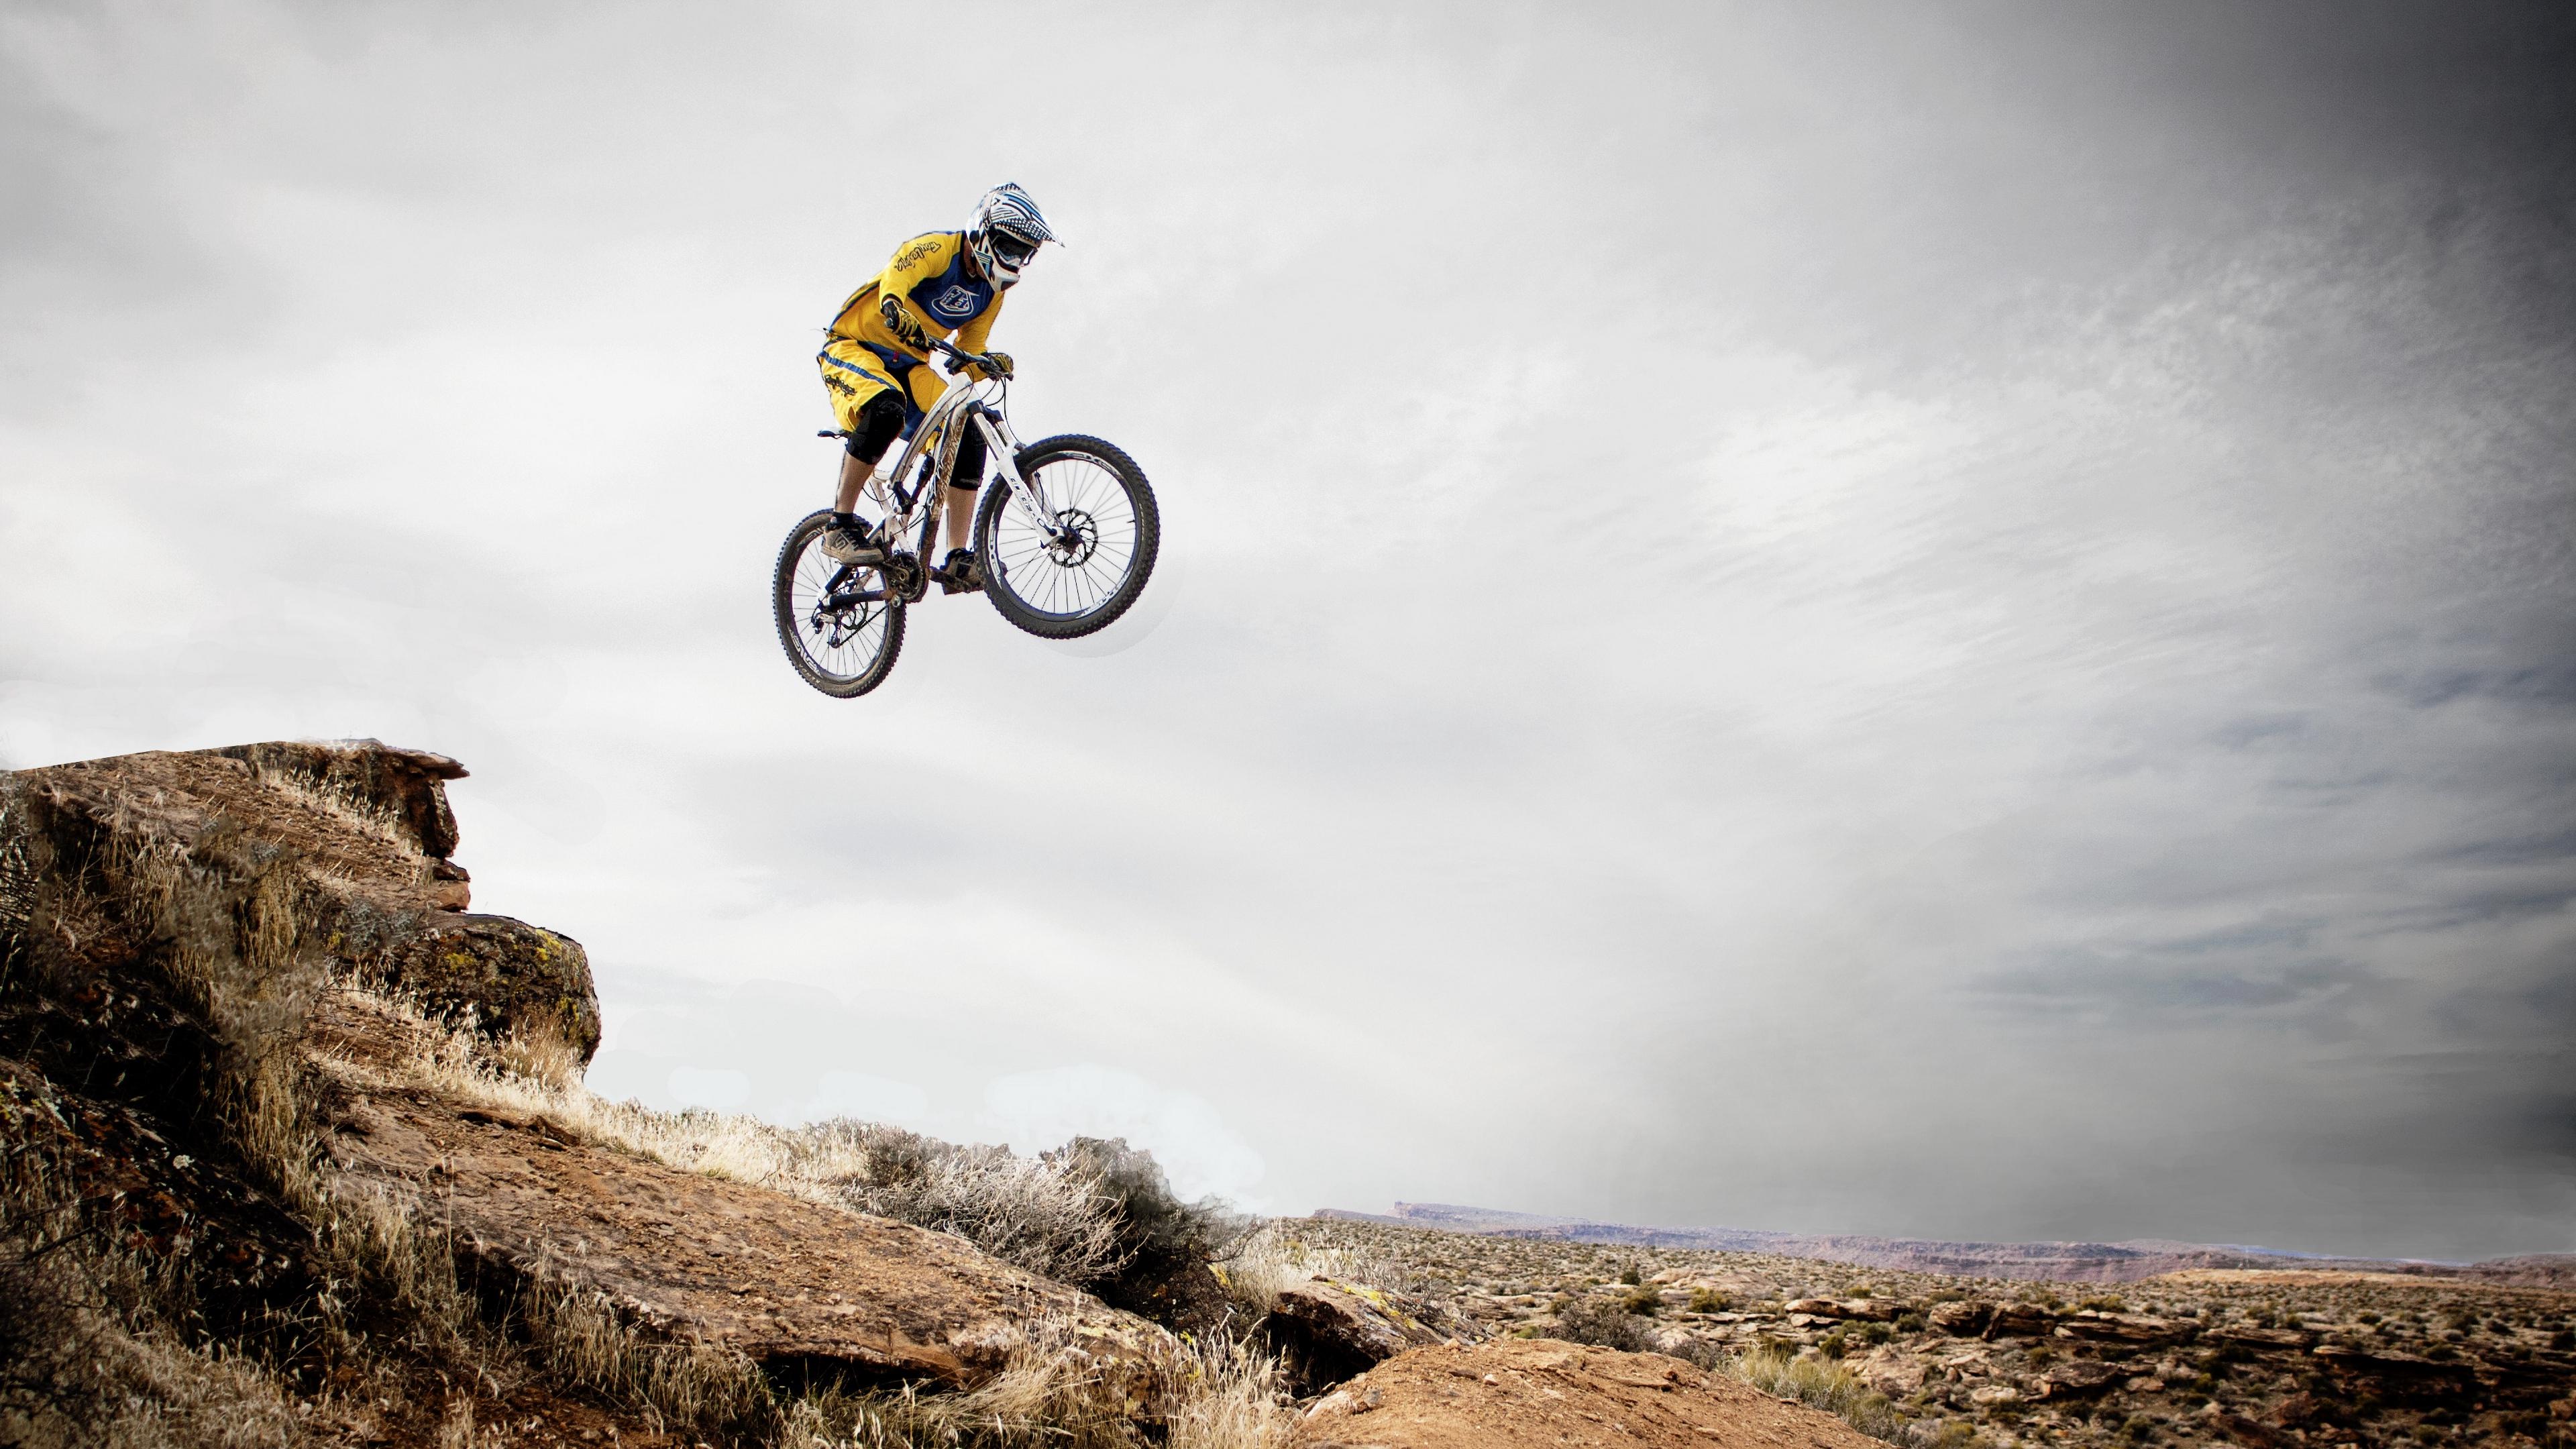 cyclist cycle racing trick jump 4k 1540062996 - cyclist, cycle racing, trick, jump 4k - trick, cyclist, cycle racing